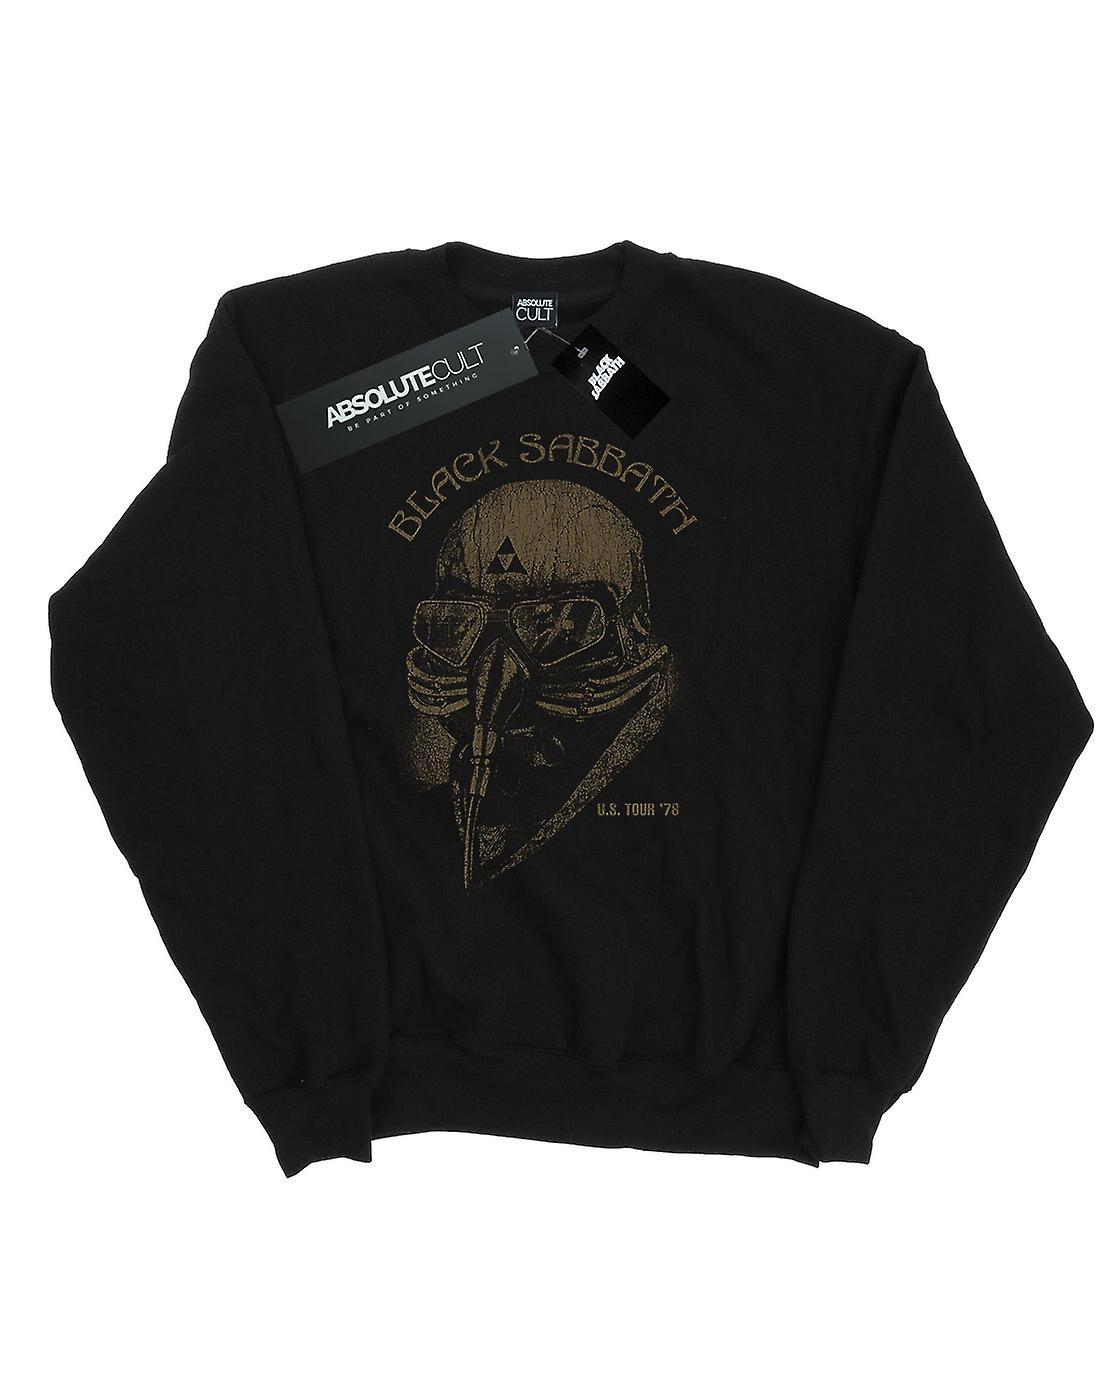 Black Sabbath Girls Tour 78 Sweatshirt